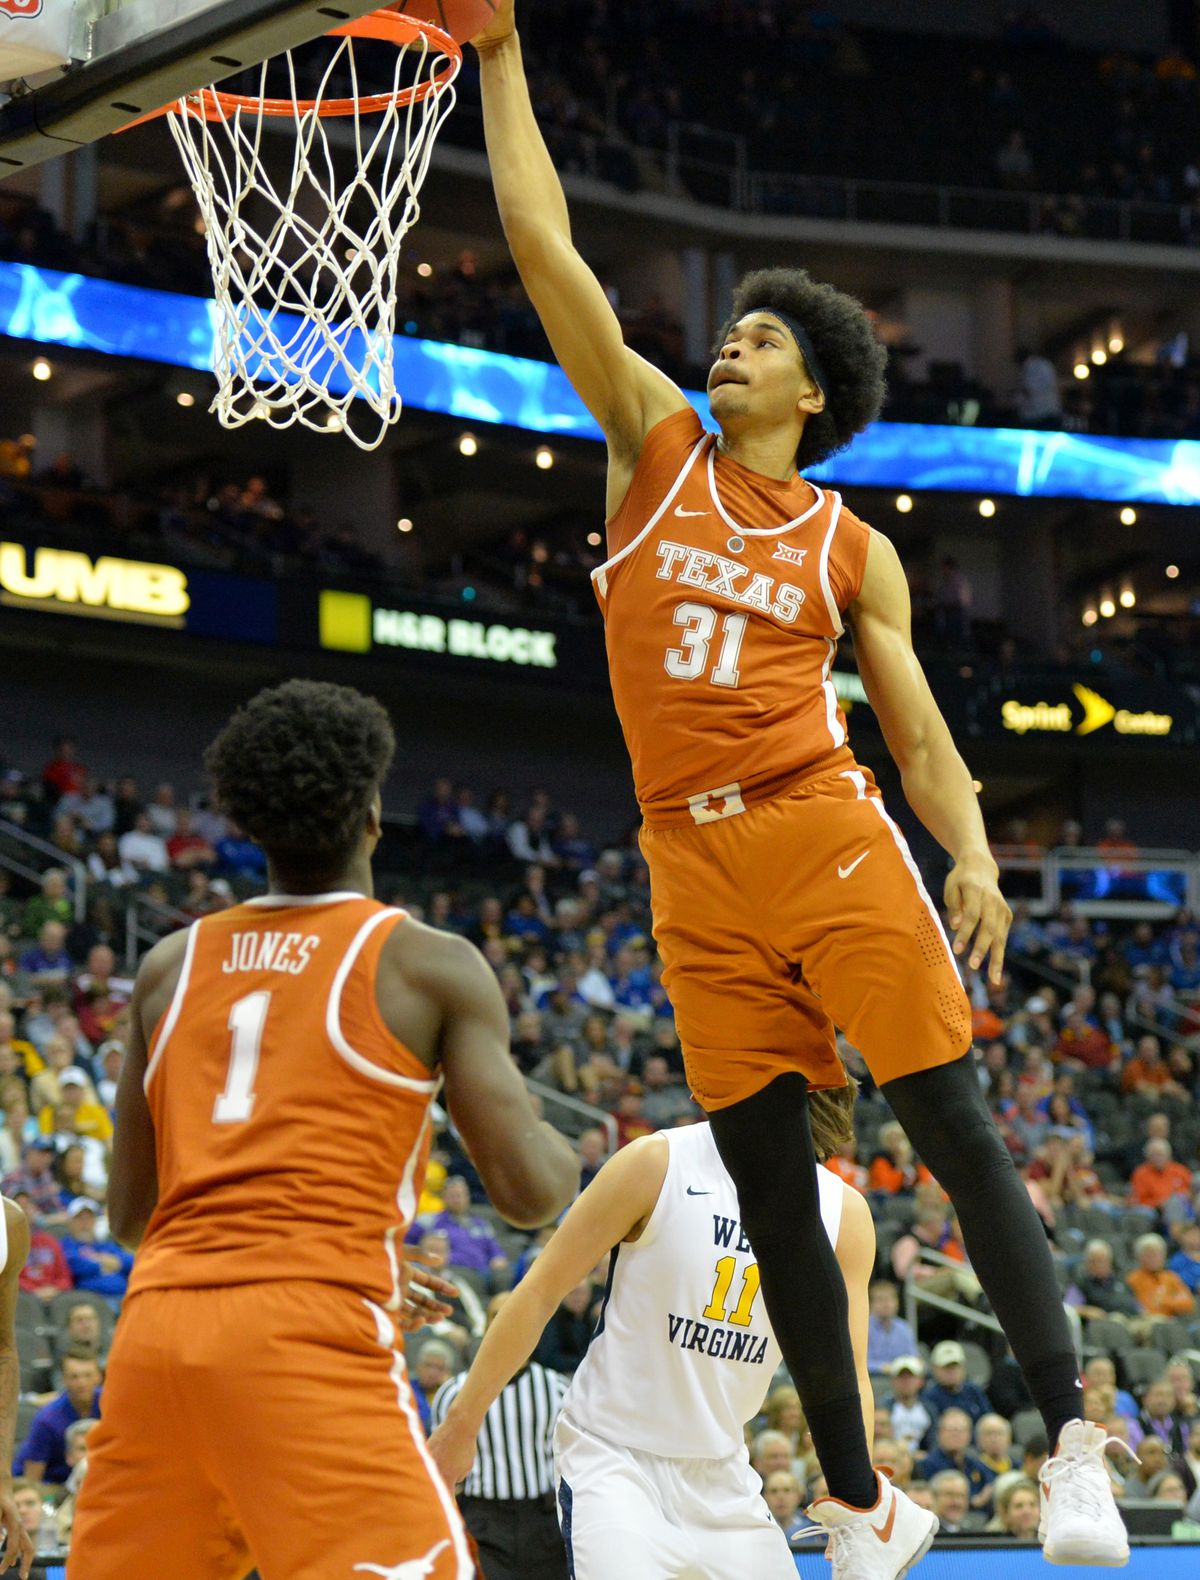 NCAA Basketball: Big 12 Championship-West Virginia vs Texas